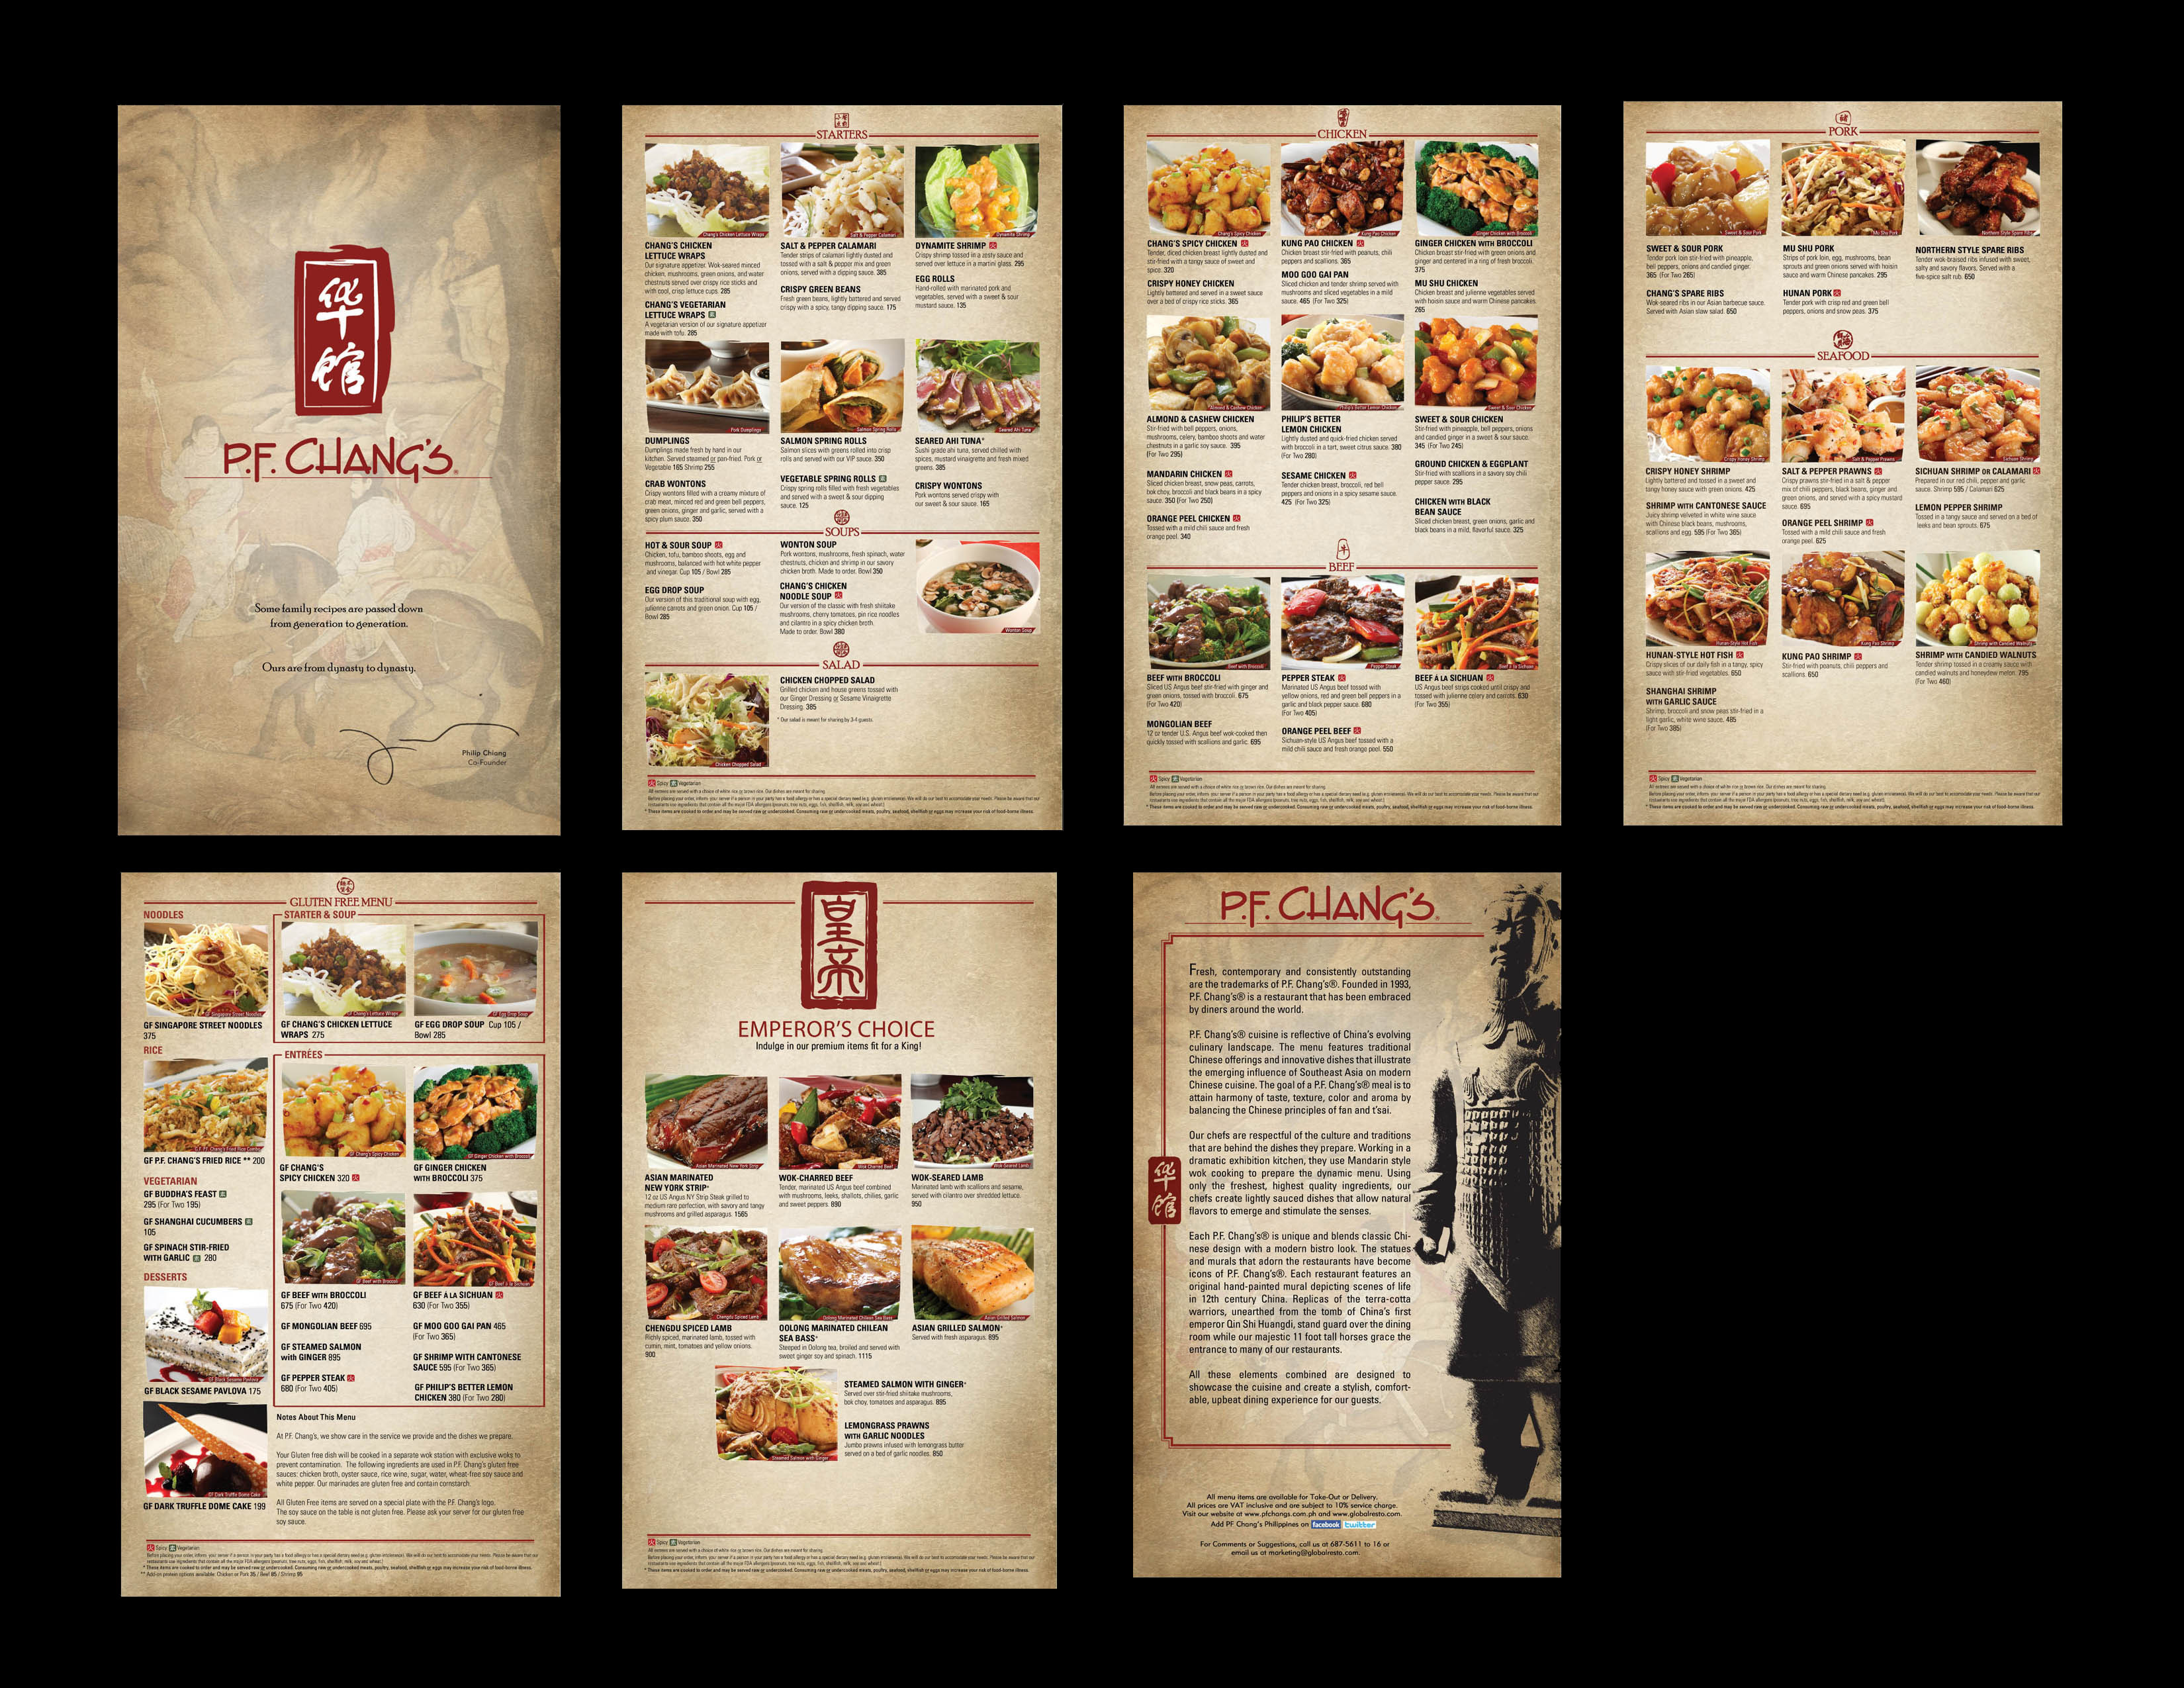 christine arigadas - p.f. chang's menu